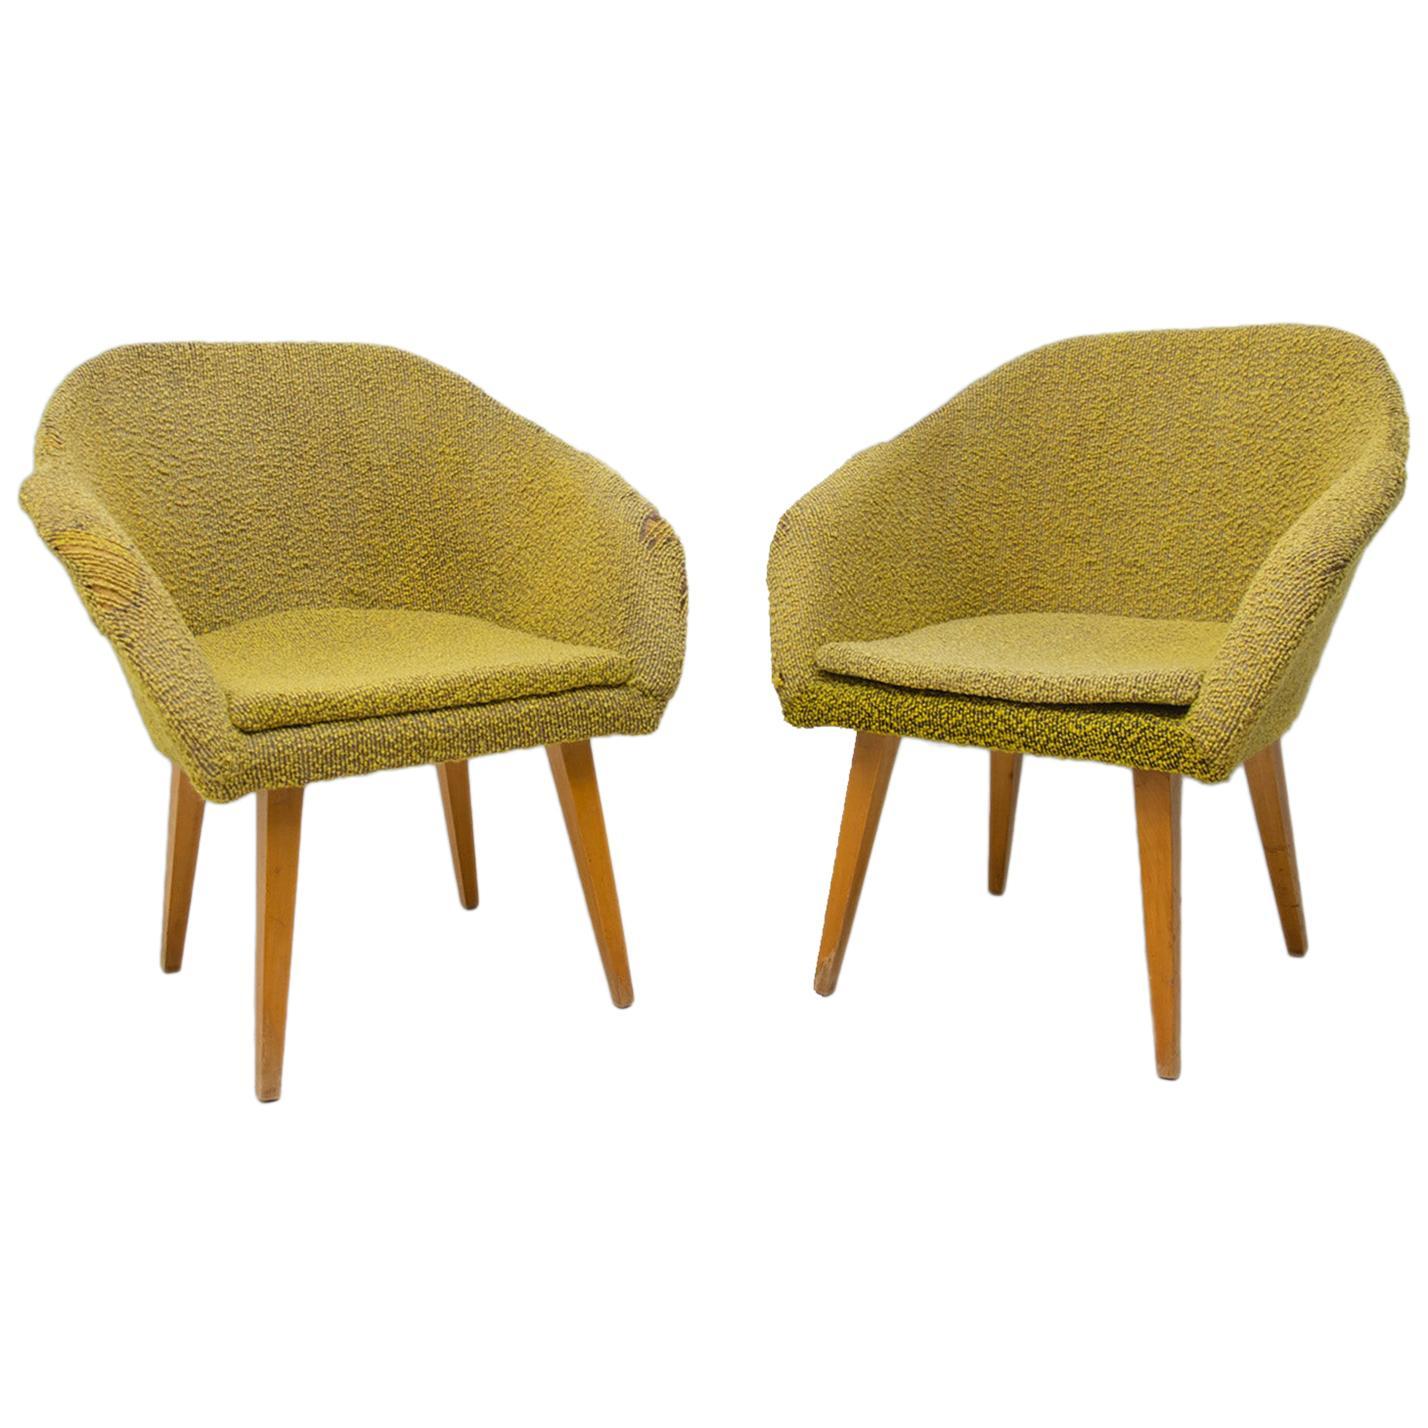 Pair of Midcentury Shell Fiberglass Lounge Chairs, Czechoslovakia, 1960s